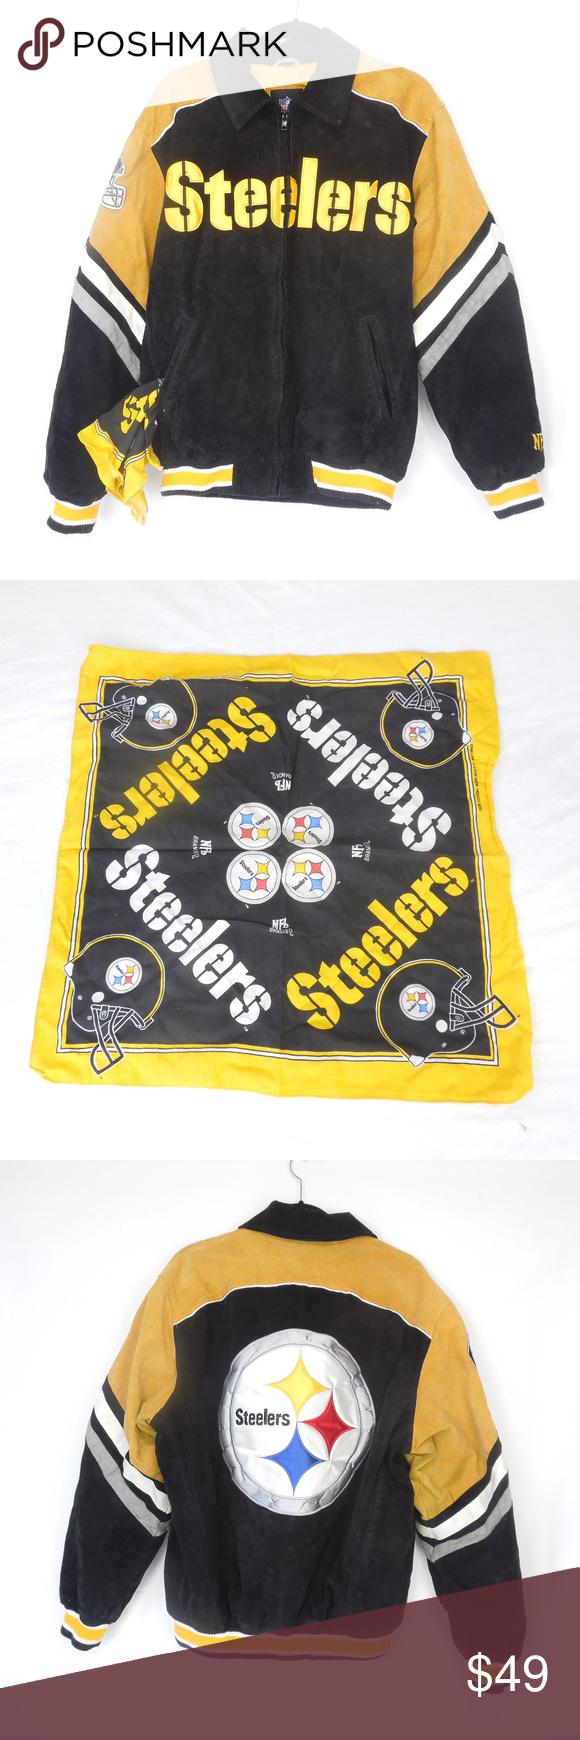 Pittsburgh Steelers Leather/Poly Jacket & Bandana PLEASE